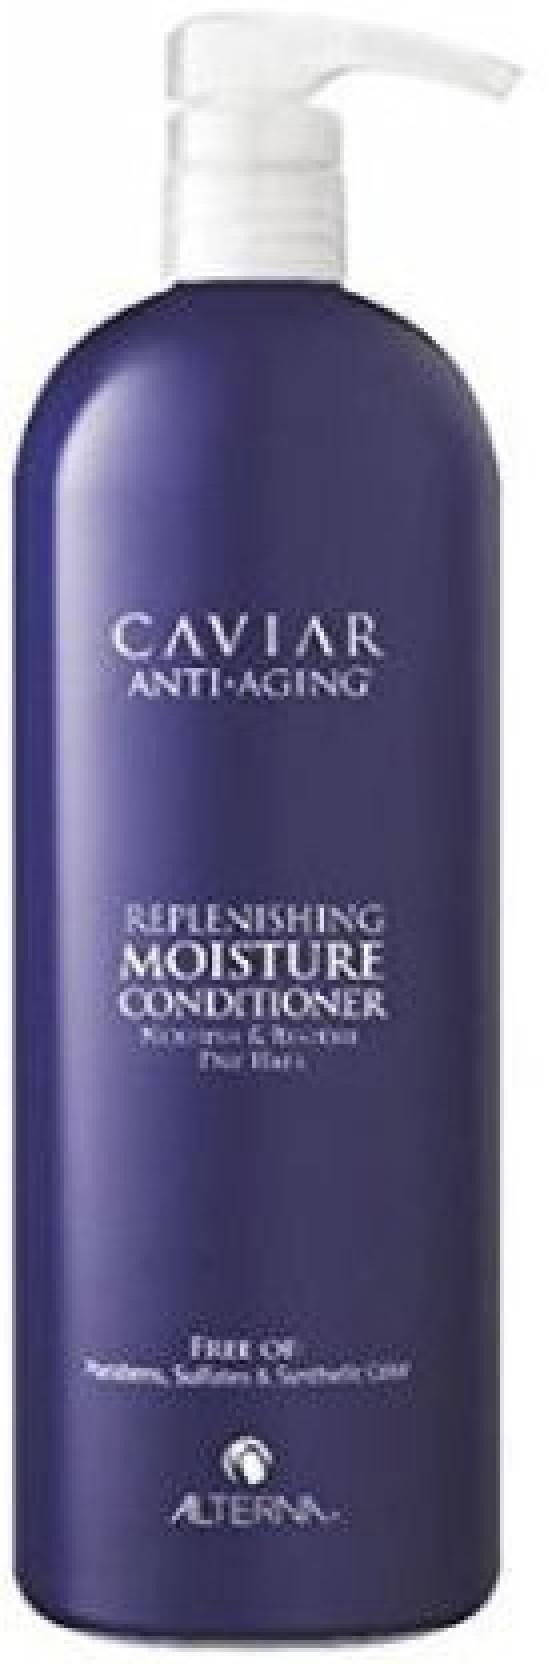 Alterna Caviar Anti Aging Replenishing Moisture Conditioner 338 The Original Share